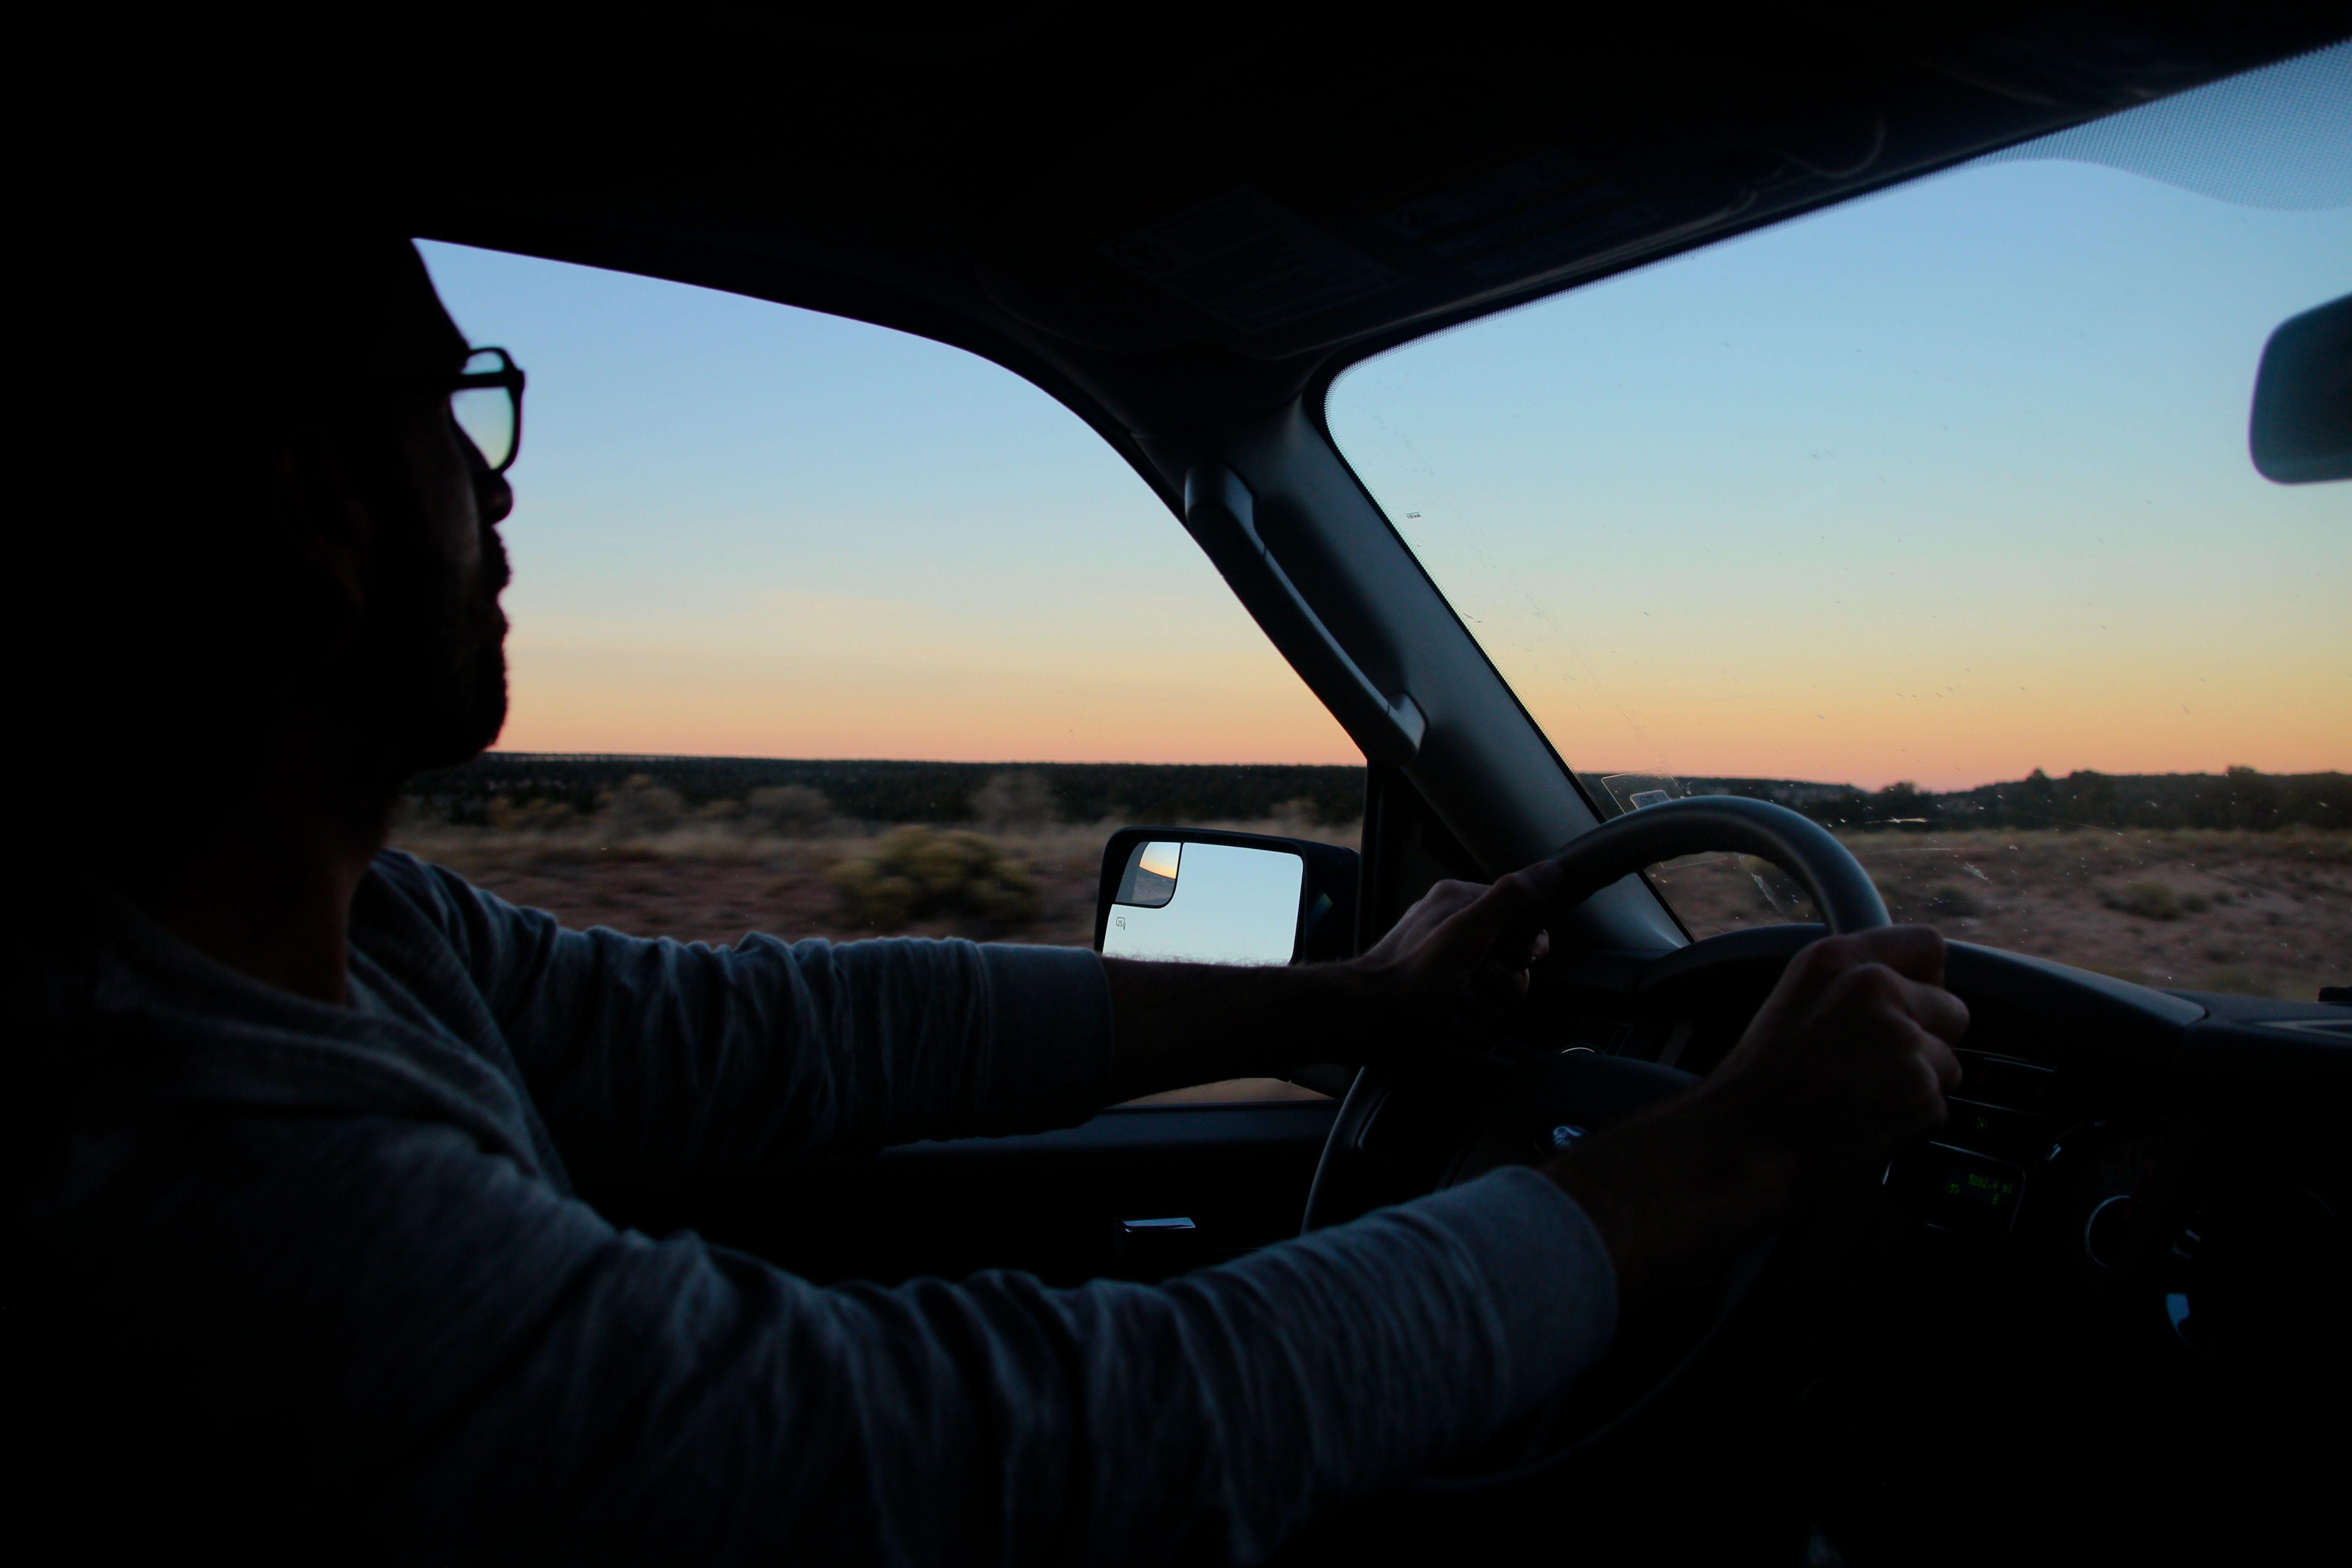 1 road trip sunset usa (c) upupup.fr